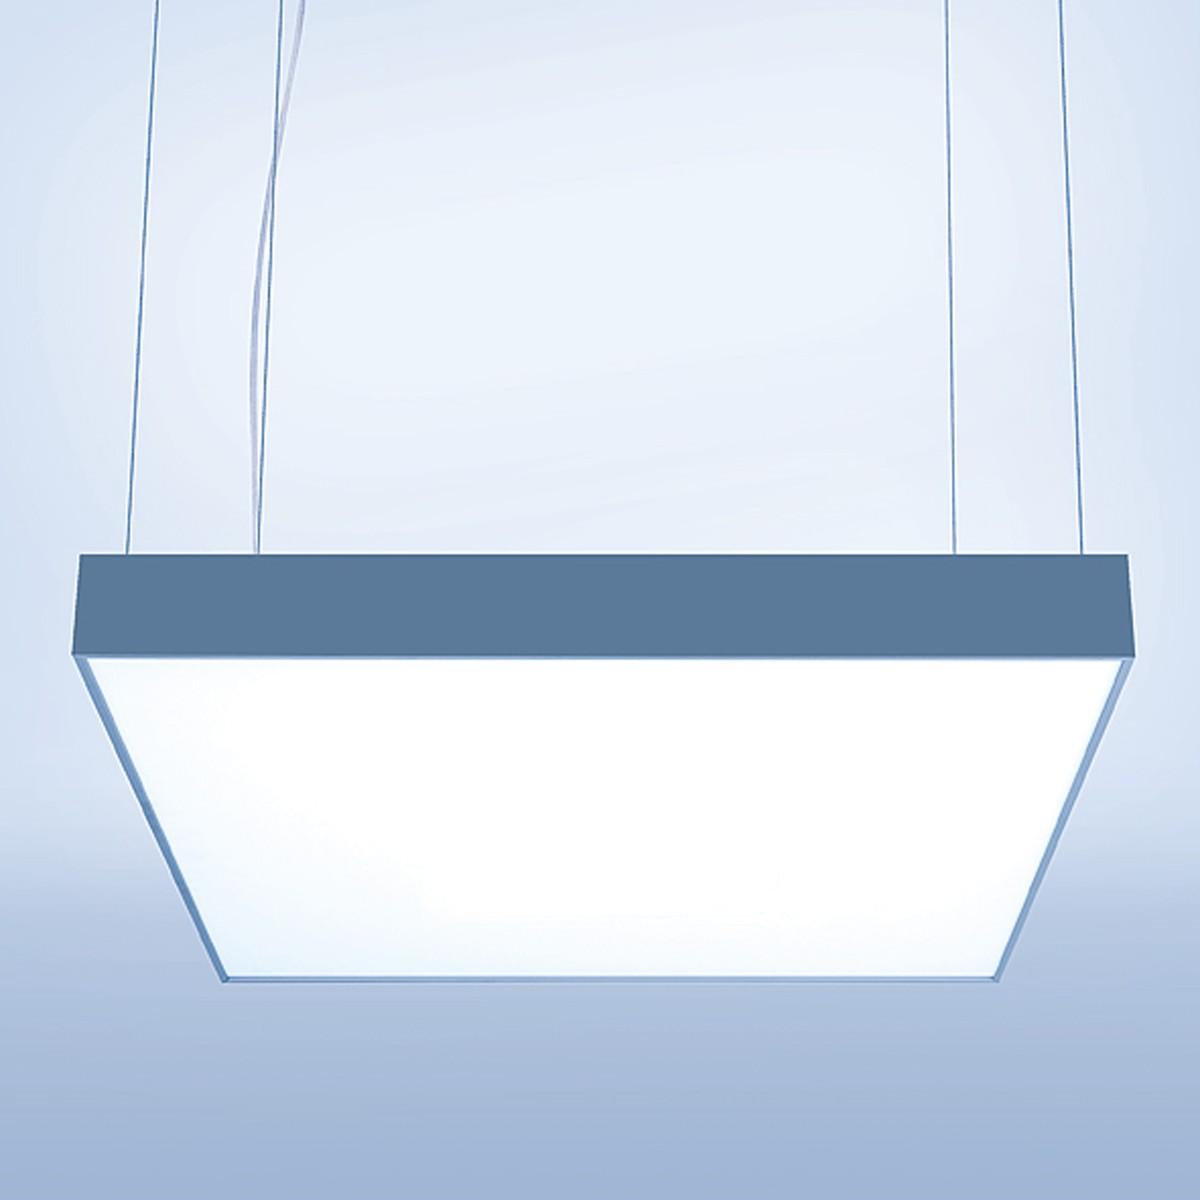 Lightnet Cubic-P2 Pendelleuchte, 43 x 43 cm, Aluminium natureloxiert